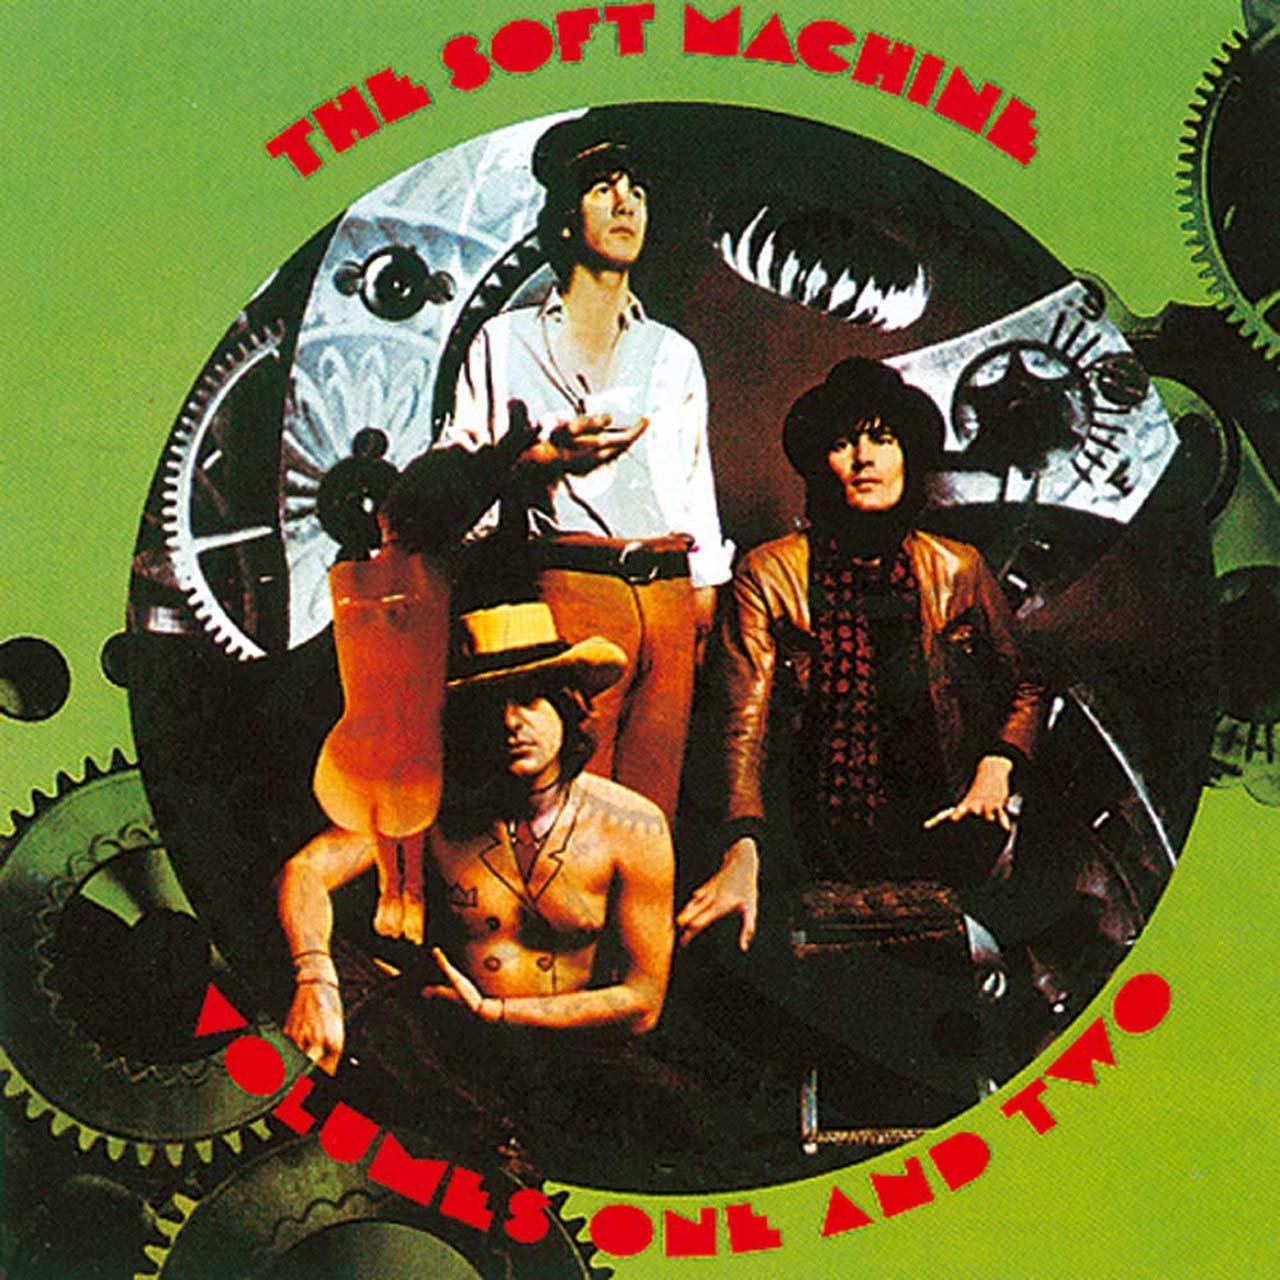 soft machine band